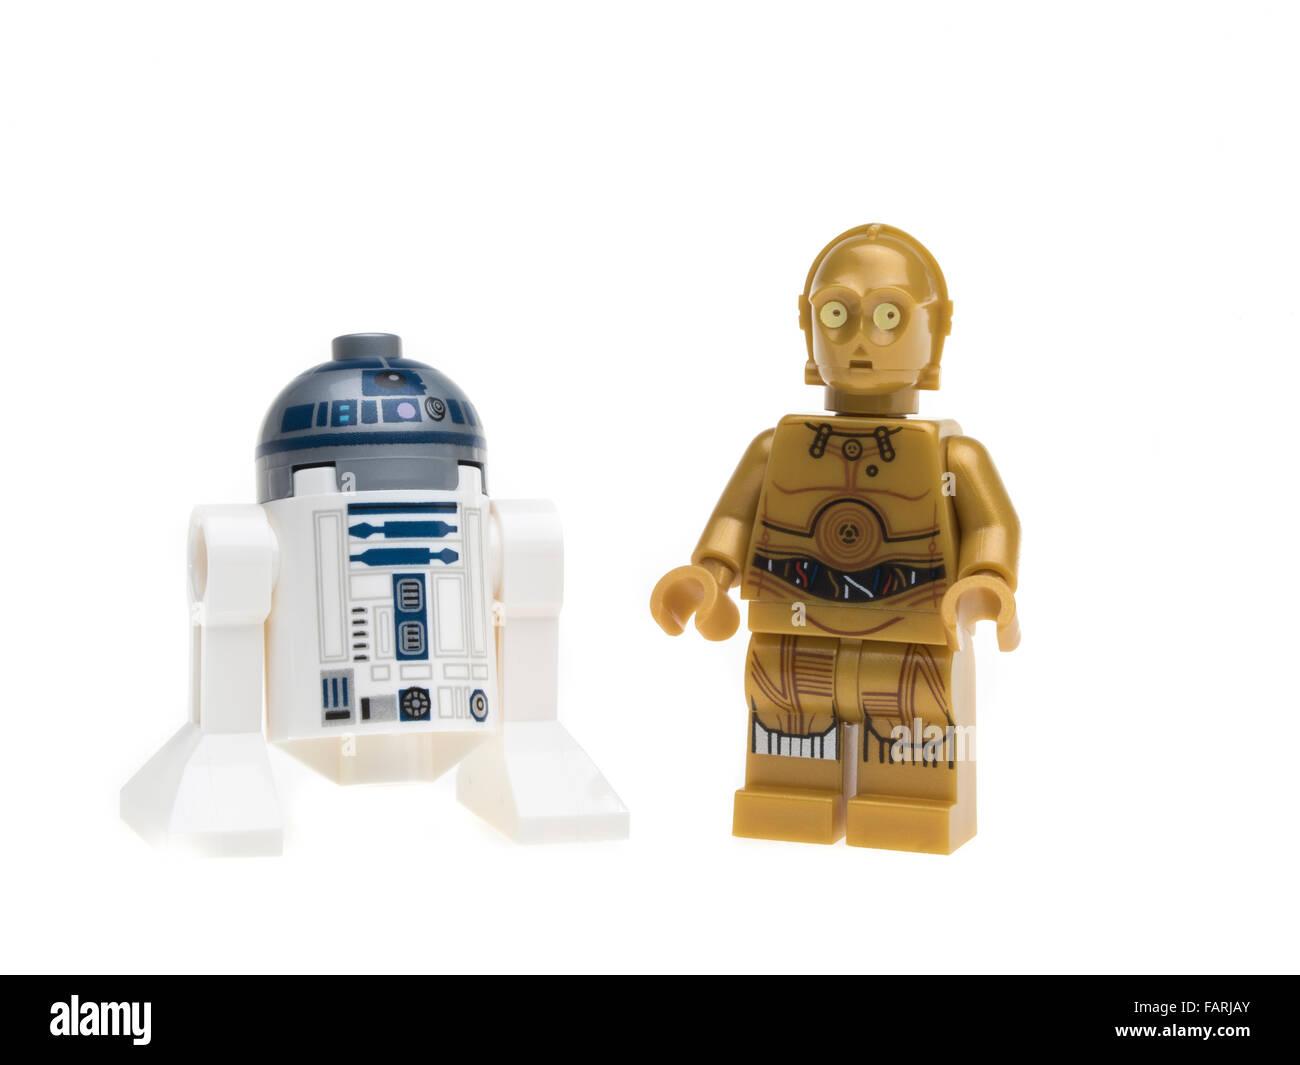 R2 d2 stock photos r2 d2 stock images alamy - Lego starwars r2d2 ...